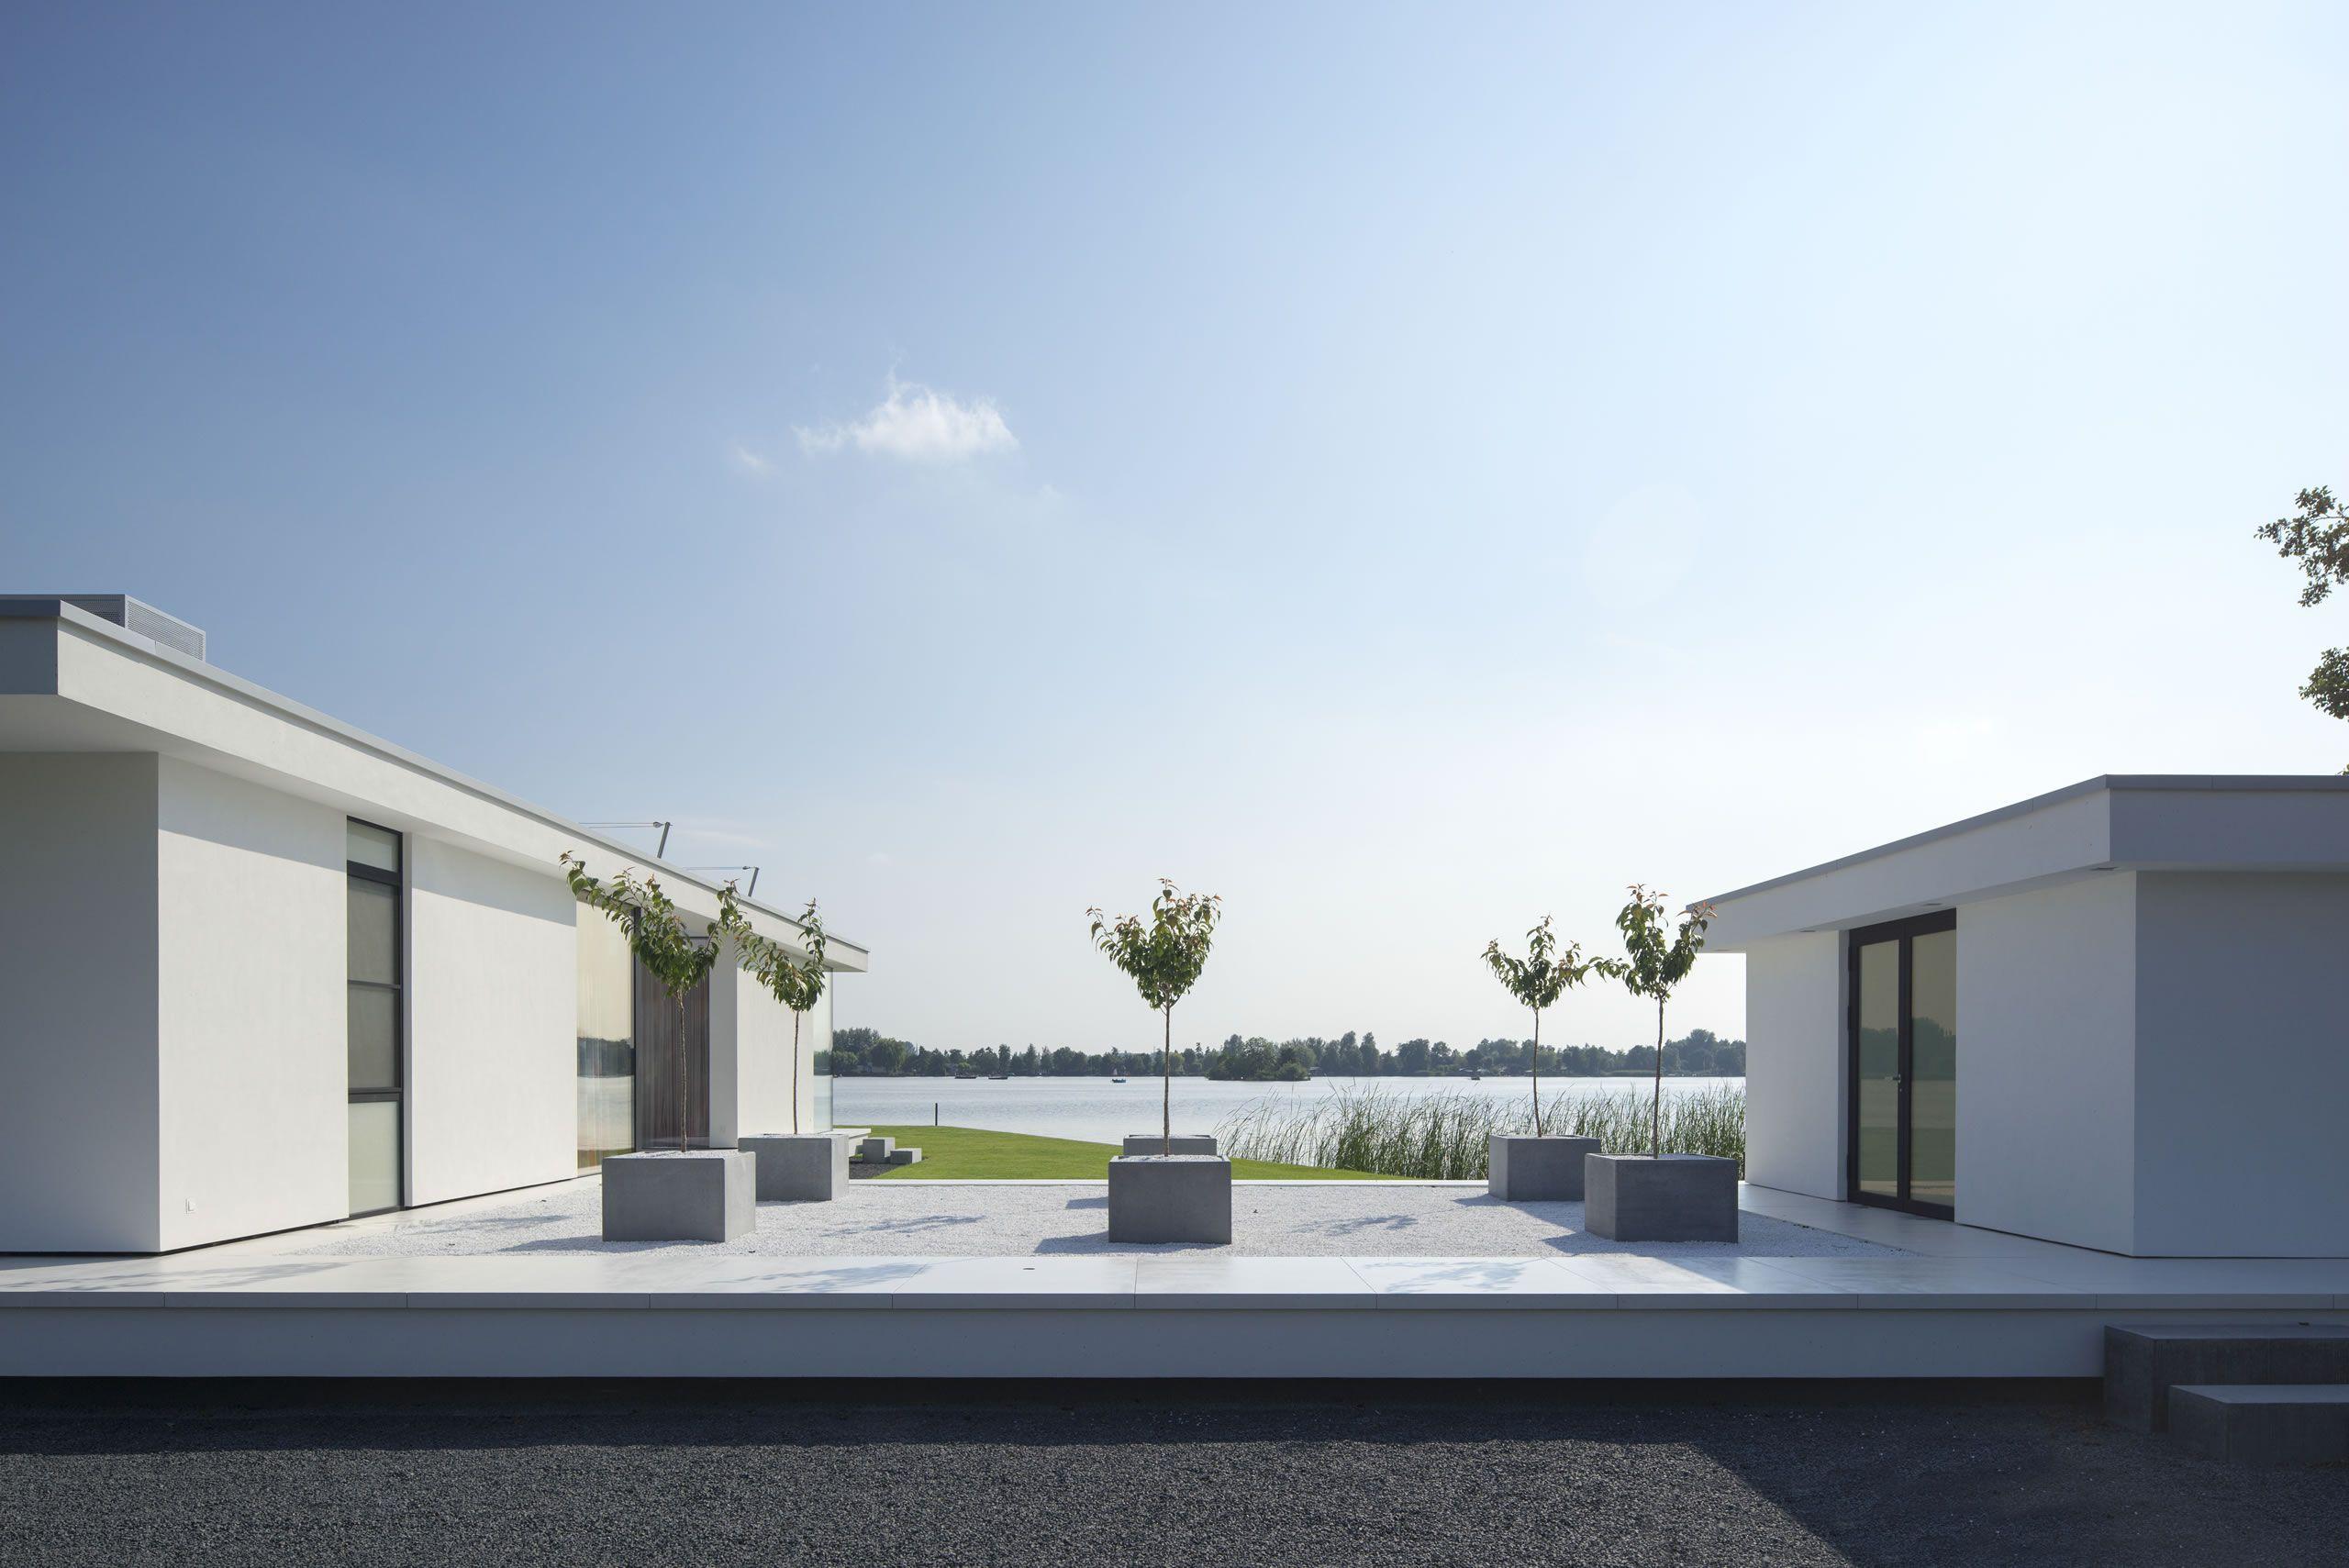 G house villa aan de reeuwijkse plas lab g house